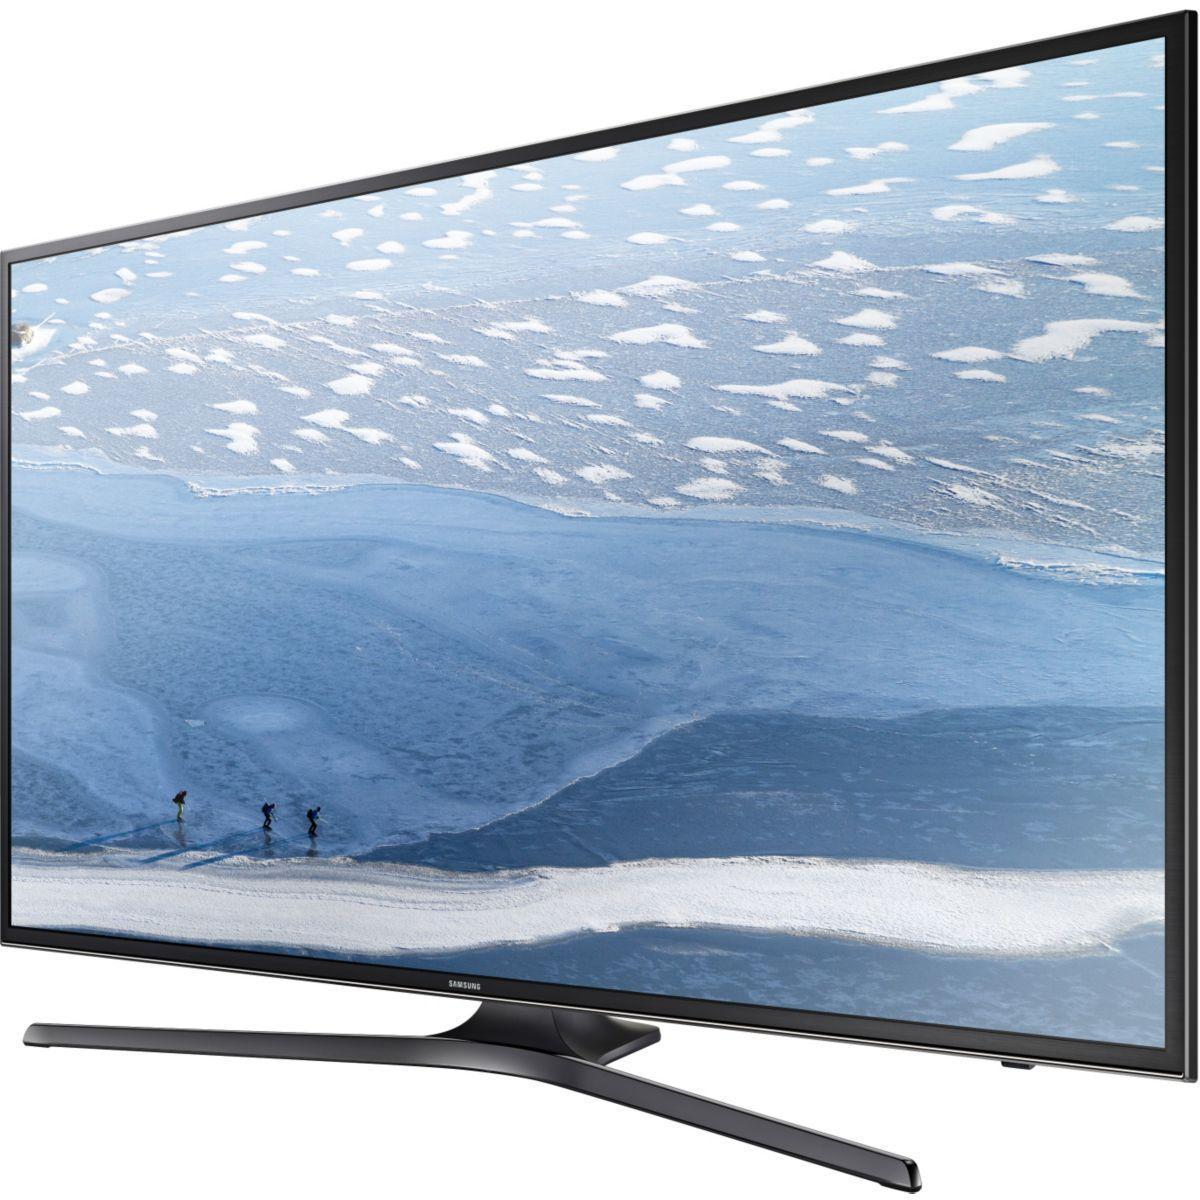 Pack promo tv samsung ue55ku6000 4k hdr 1300 pqi smart tv + barre de son samsung hwj355 - soldes et bonnes affaires à prix imbattables